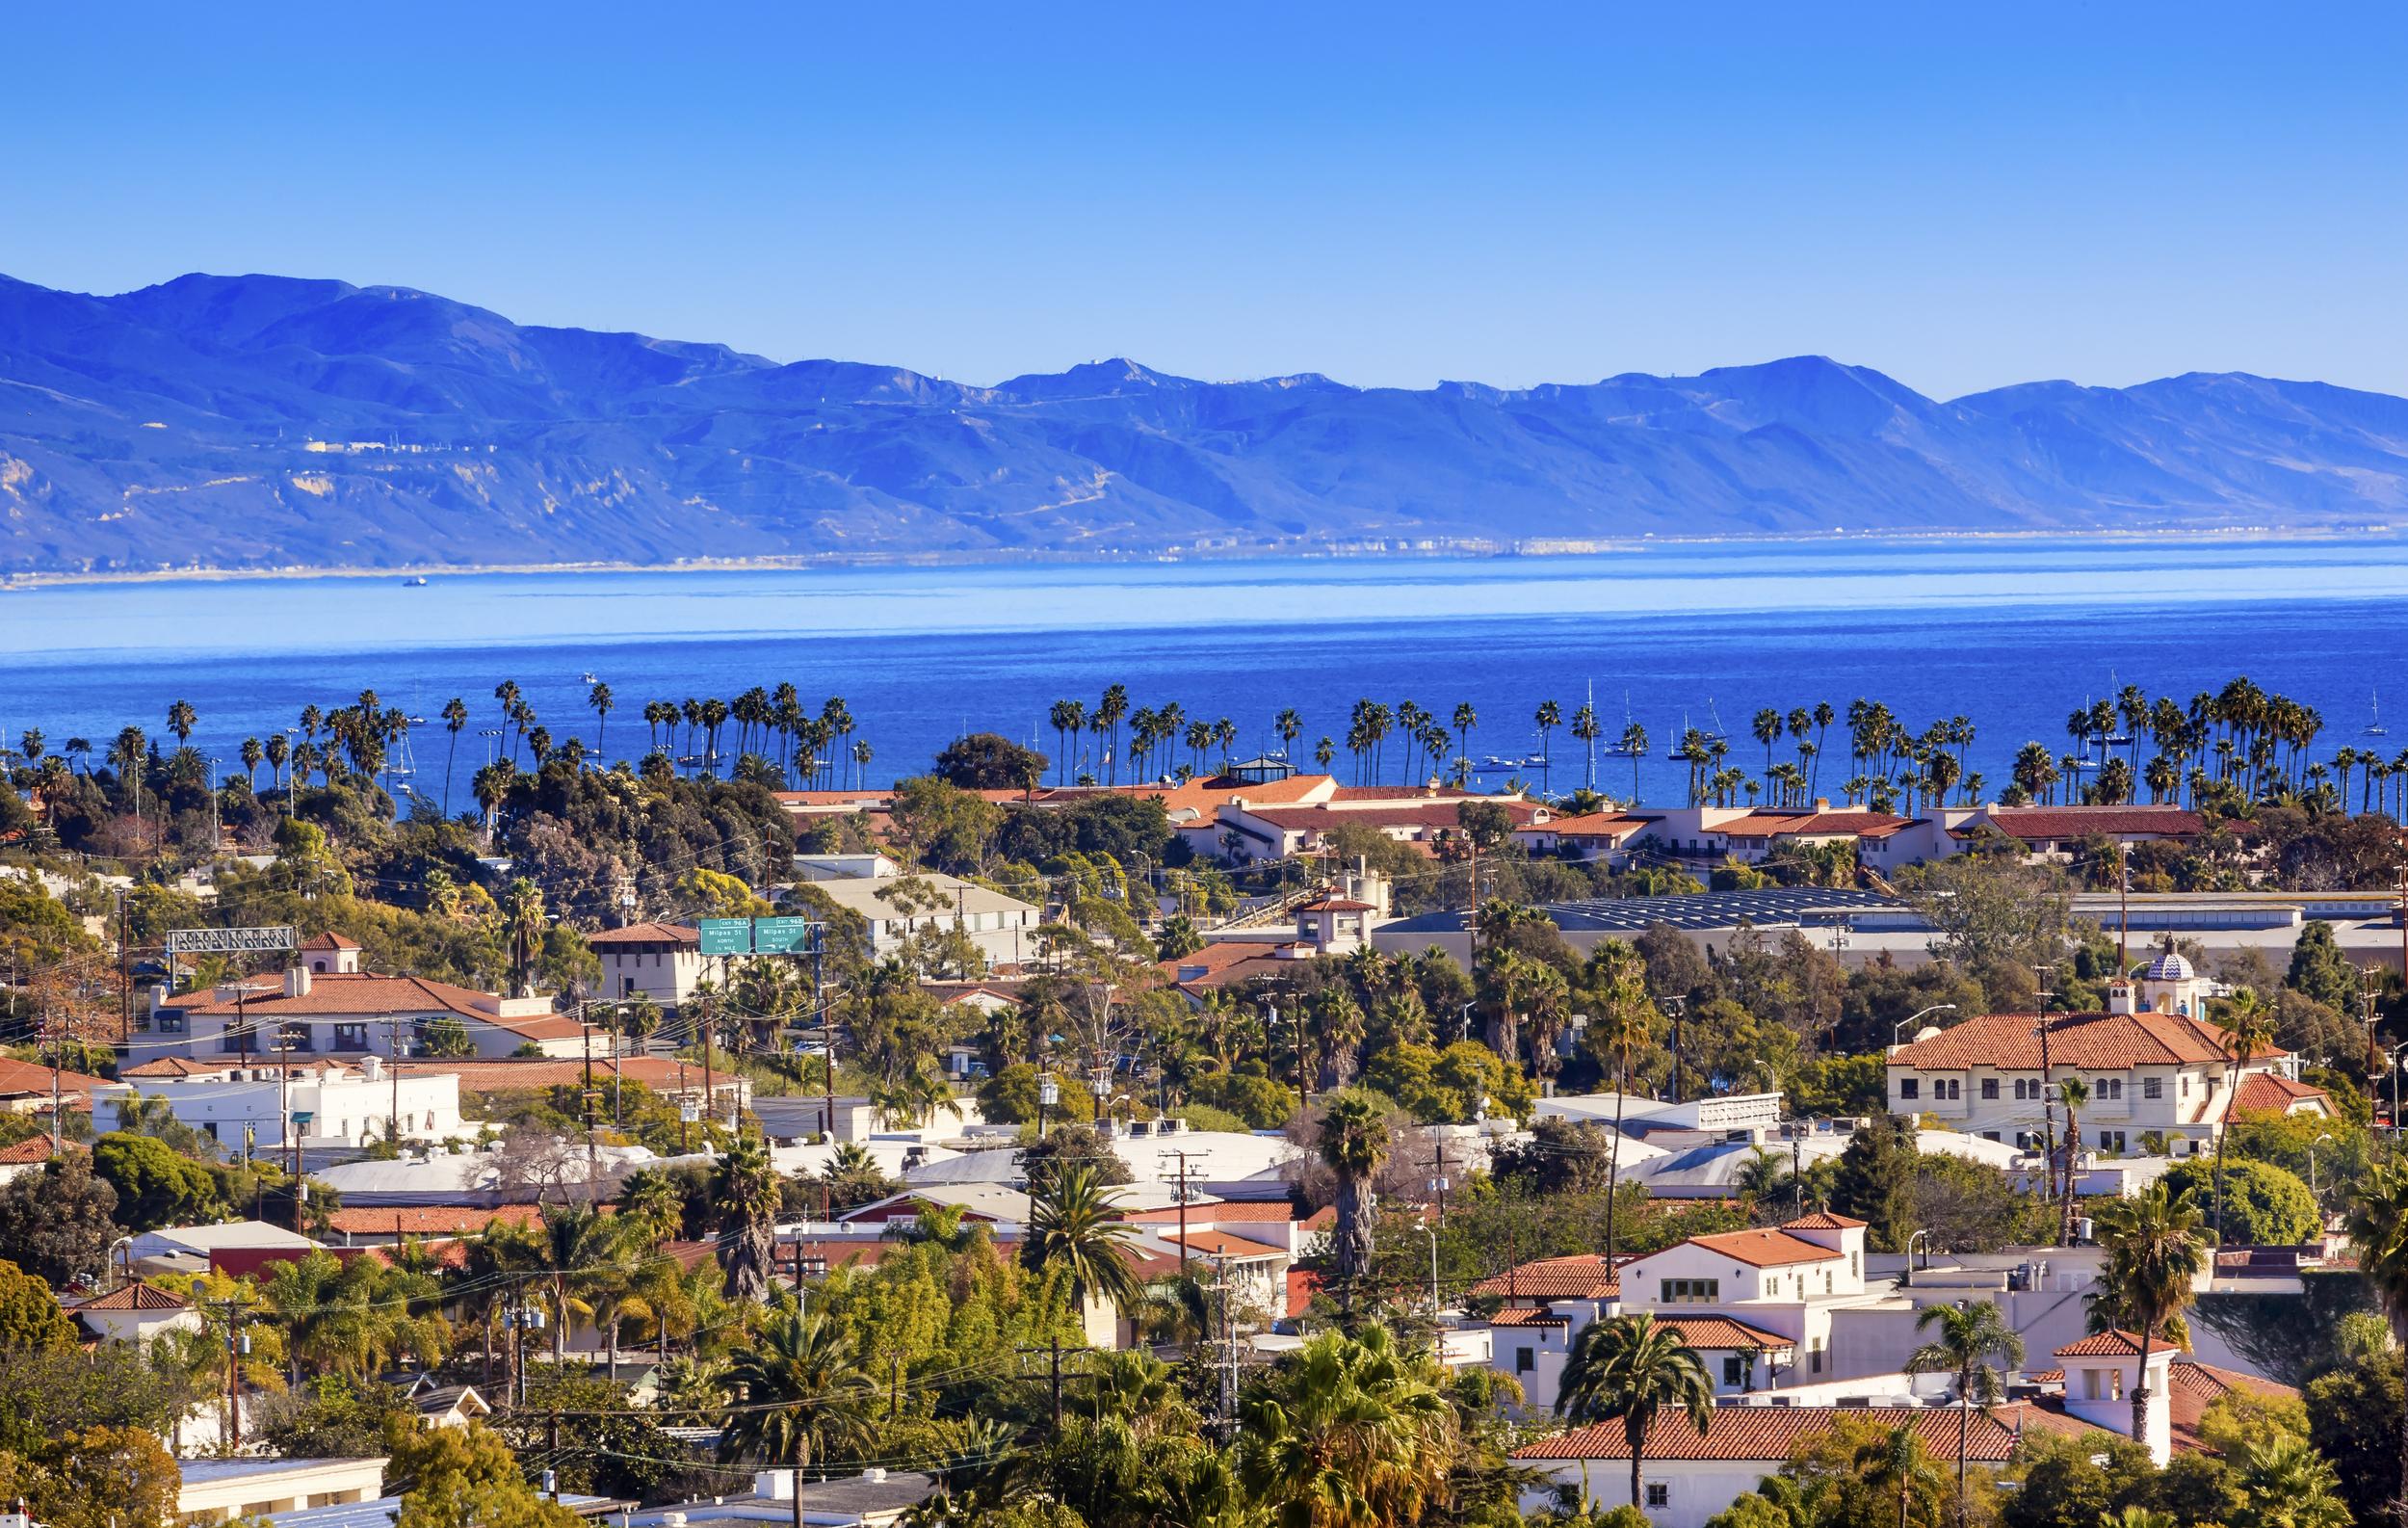 Santa Barbara, in the beautiful Central Coast of California